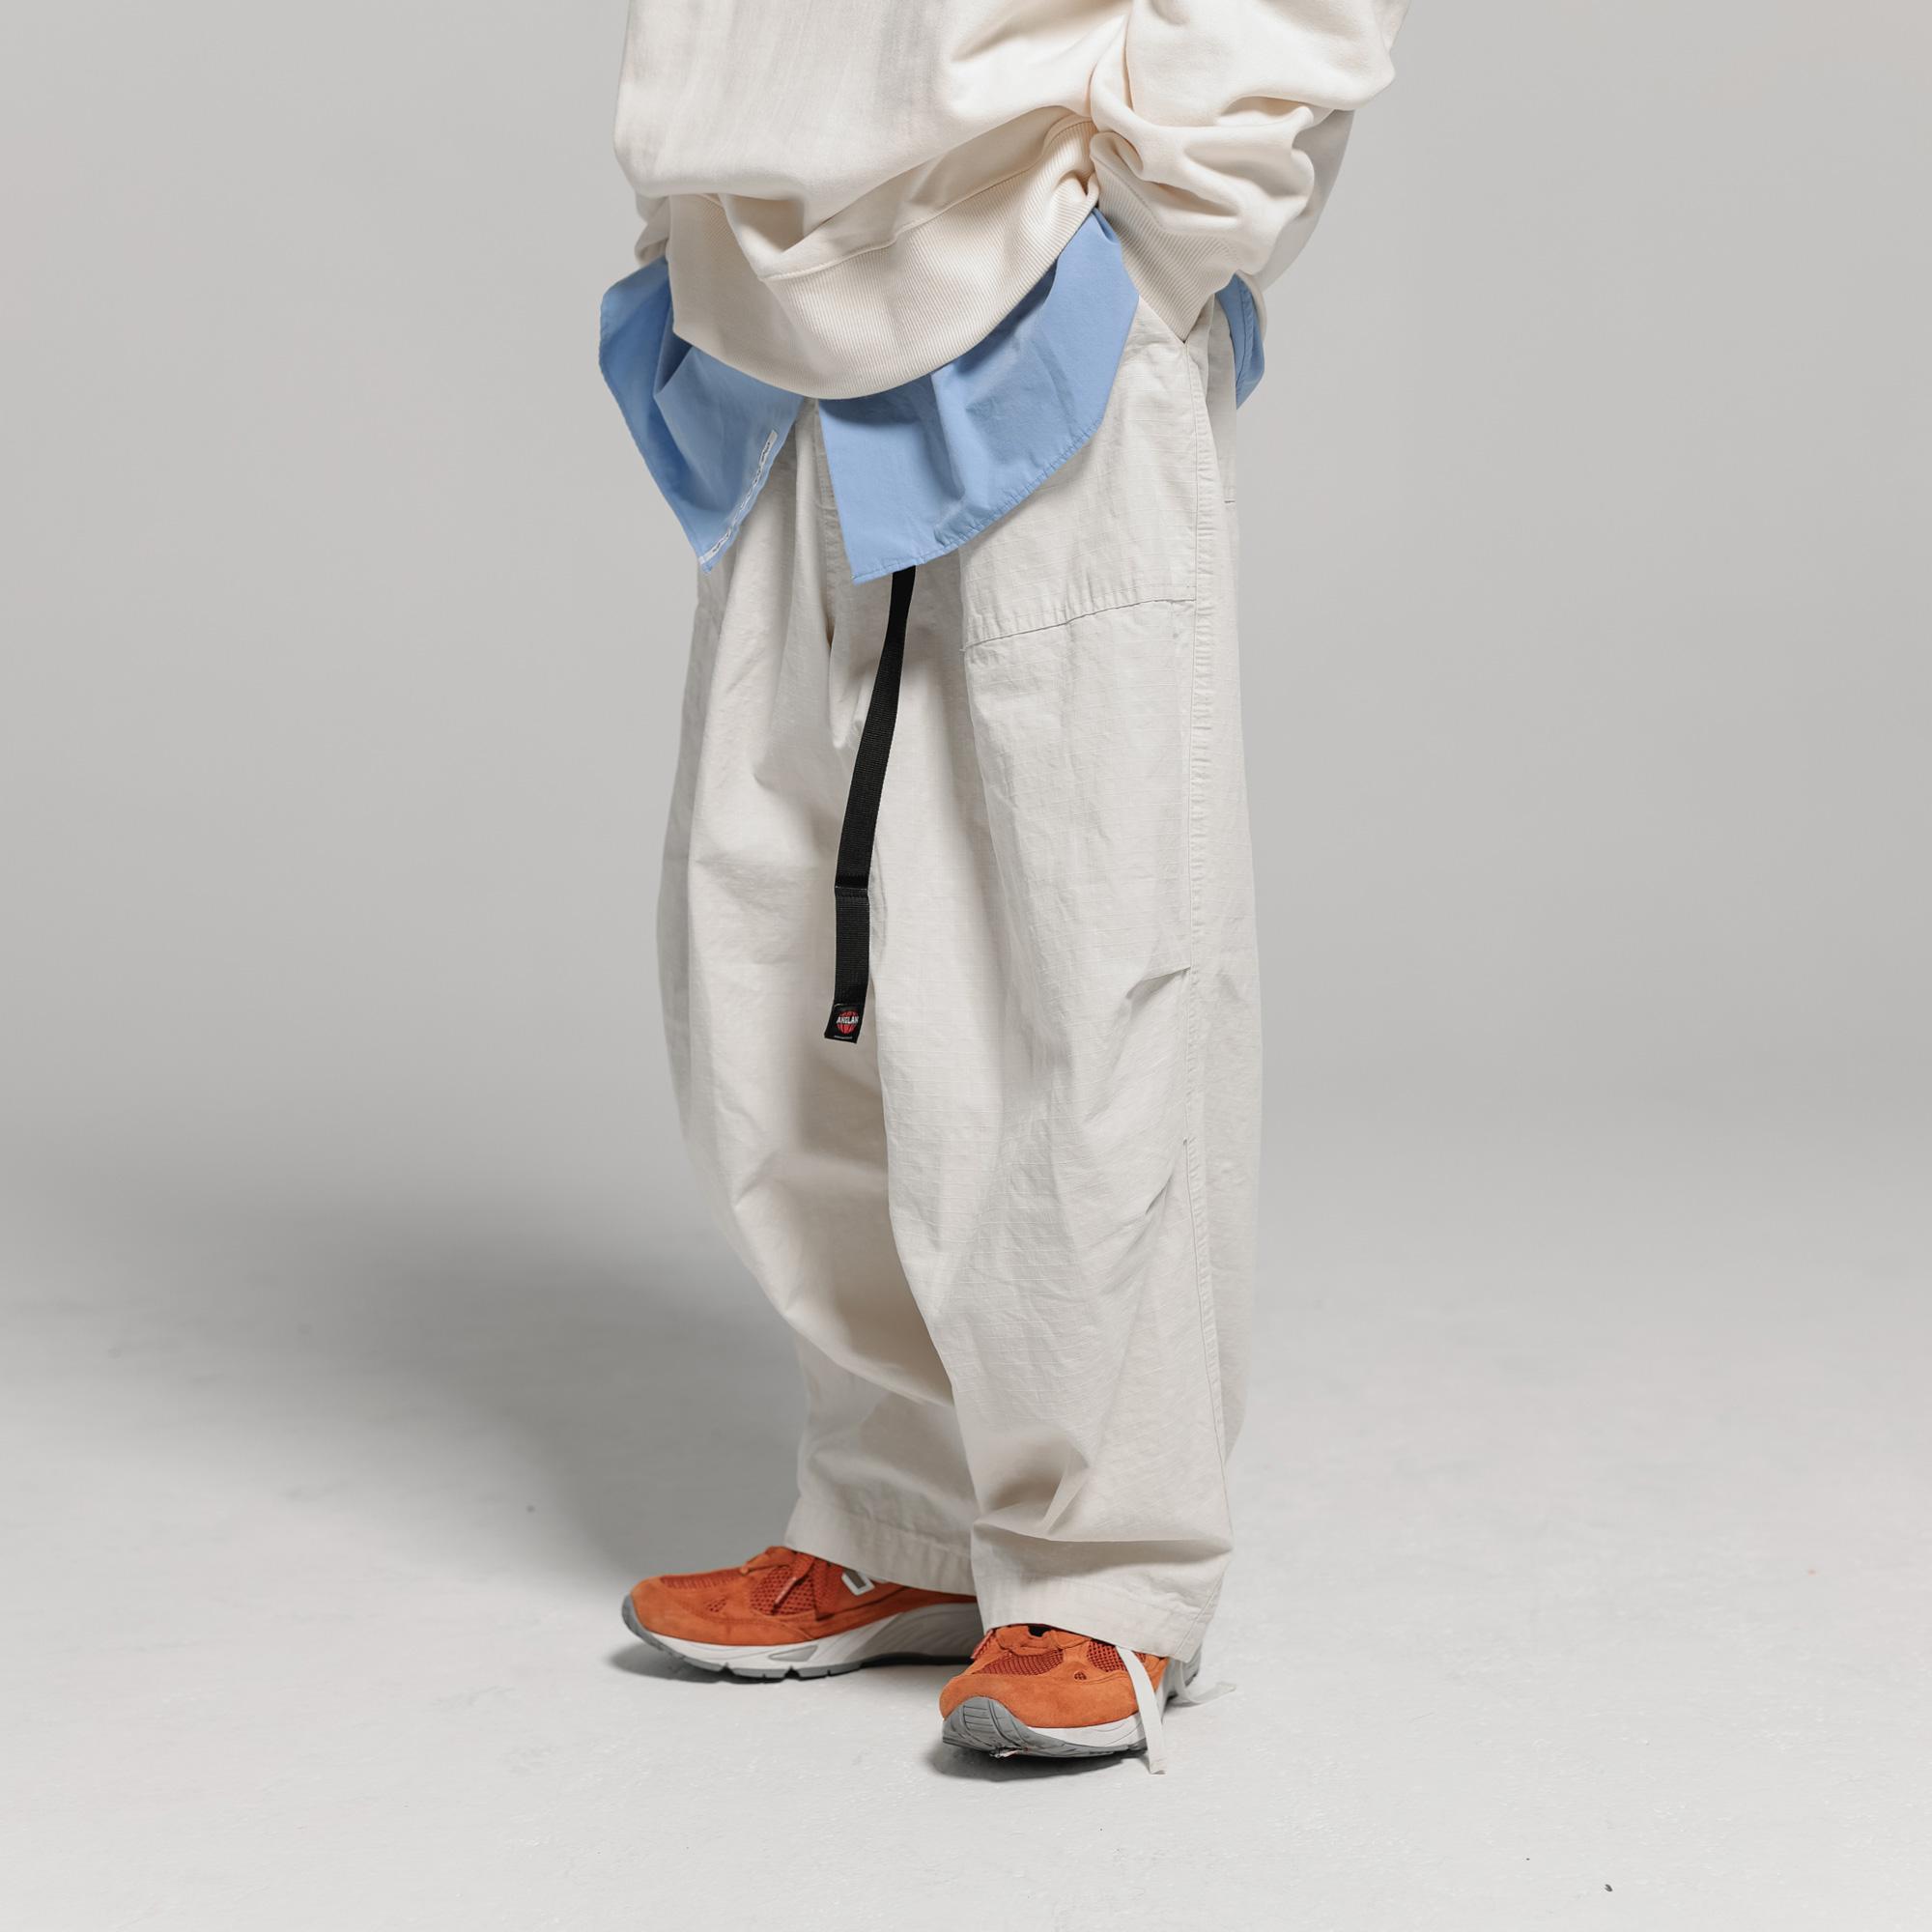 [AG] Fatigue Rib Army Balloon Pants - Ivory